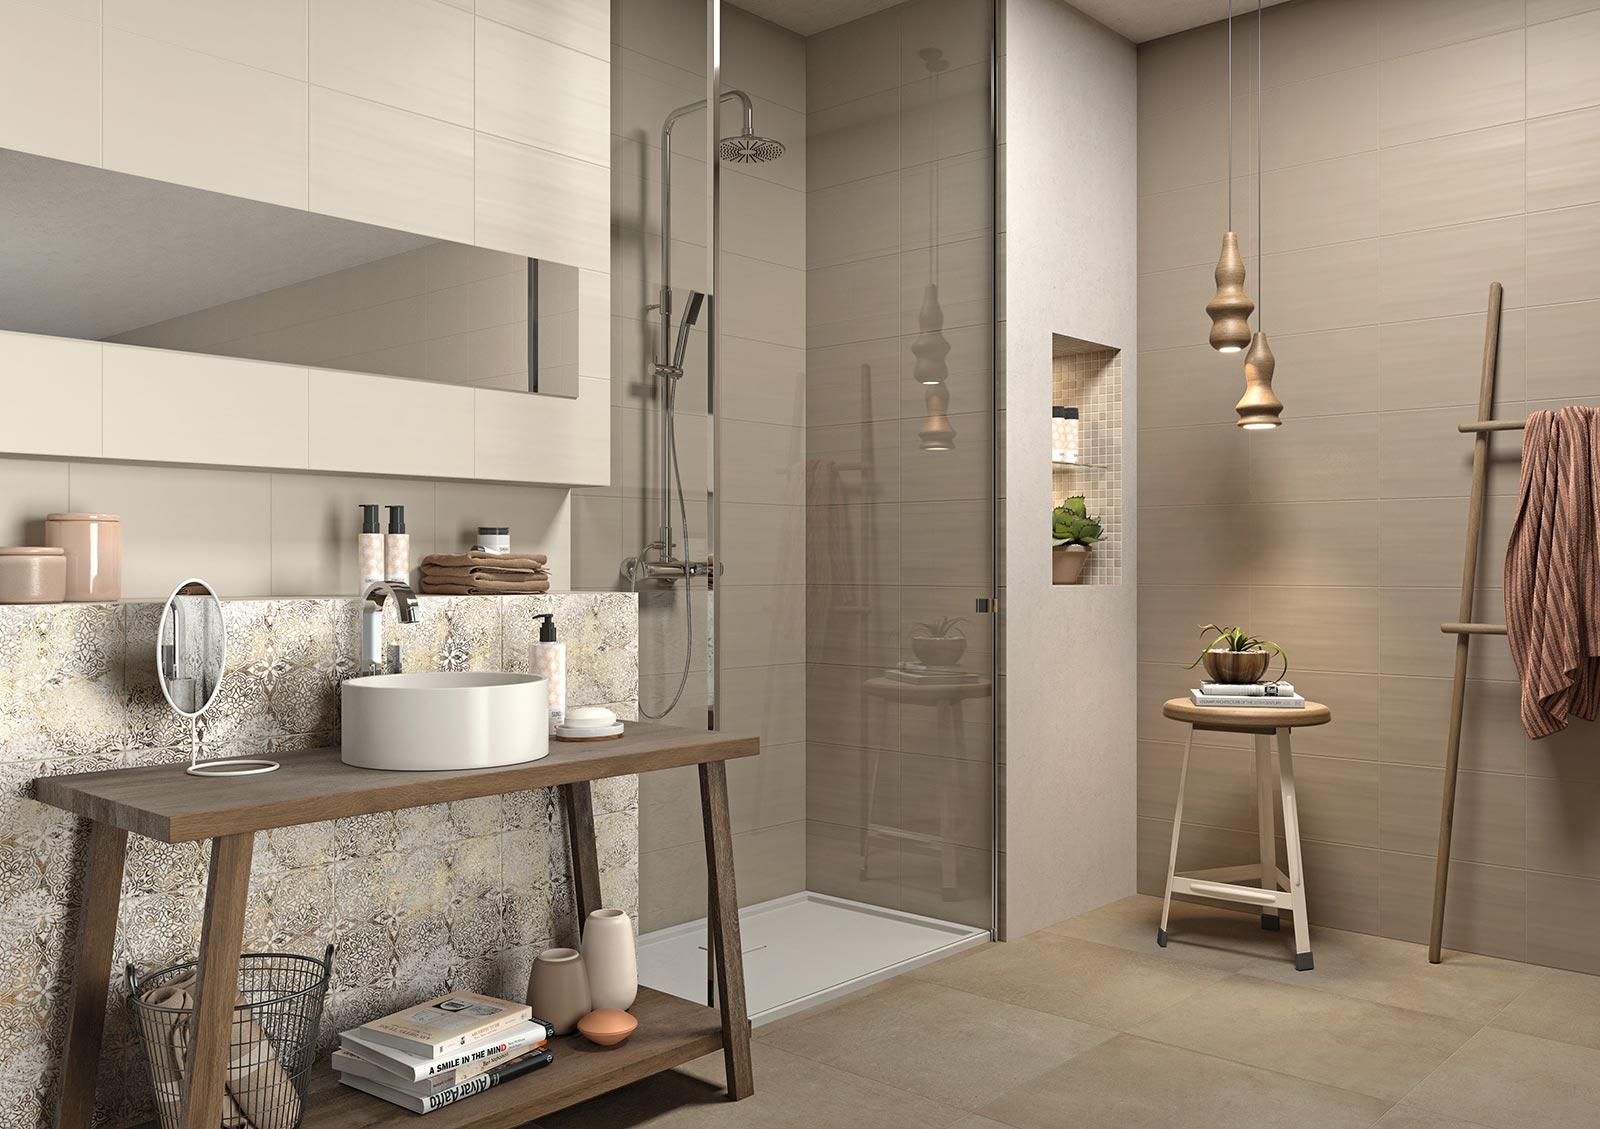 Neutral bathroom and kitchen tiles marazzi for Carrelage marazzi